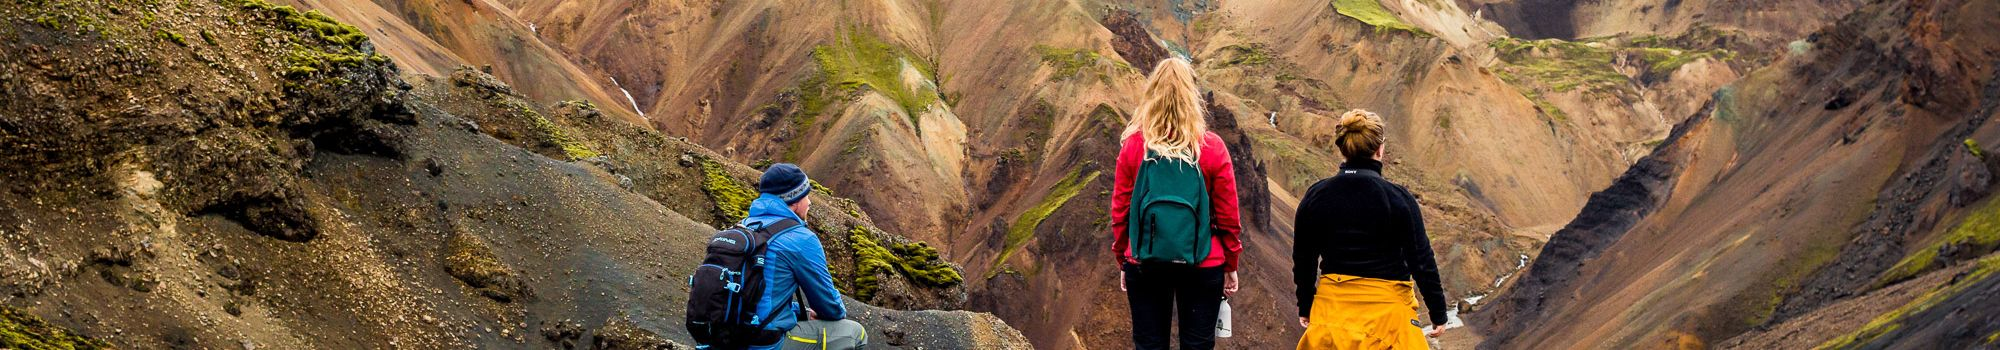 Landmannalaugar-Iceland-Laugavegur-trail-trekking